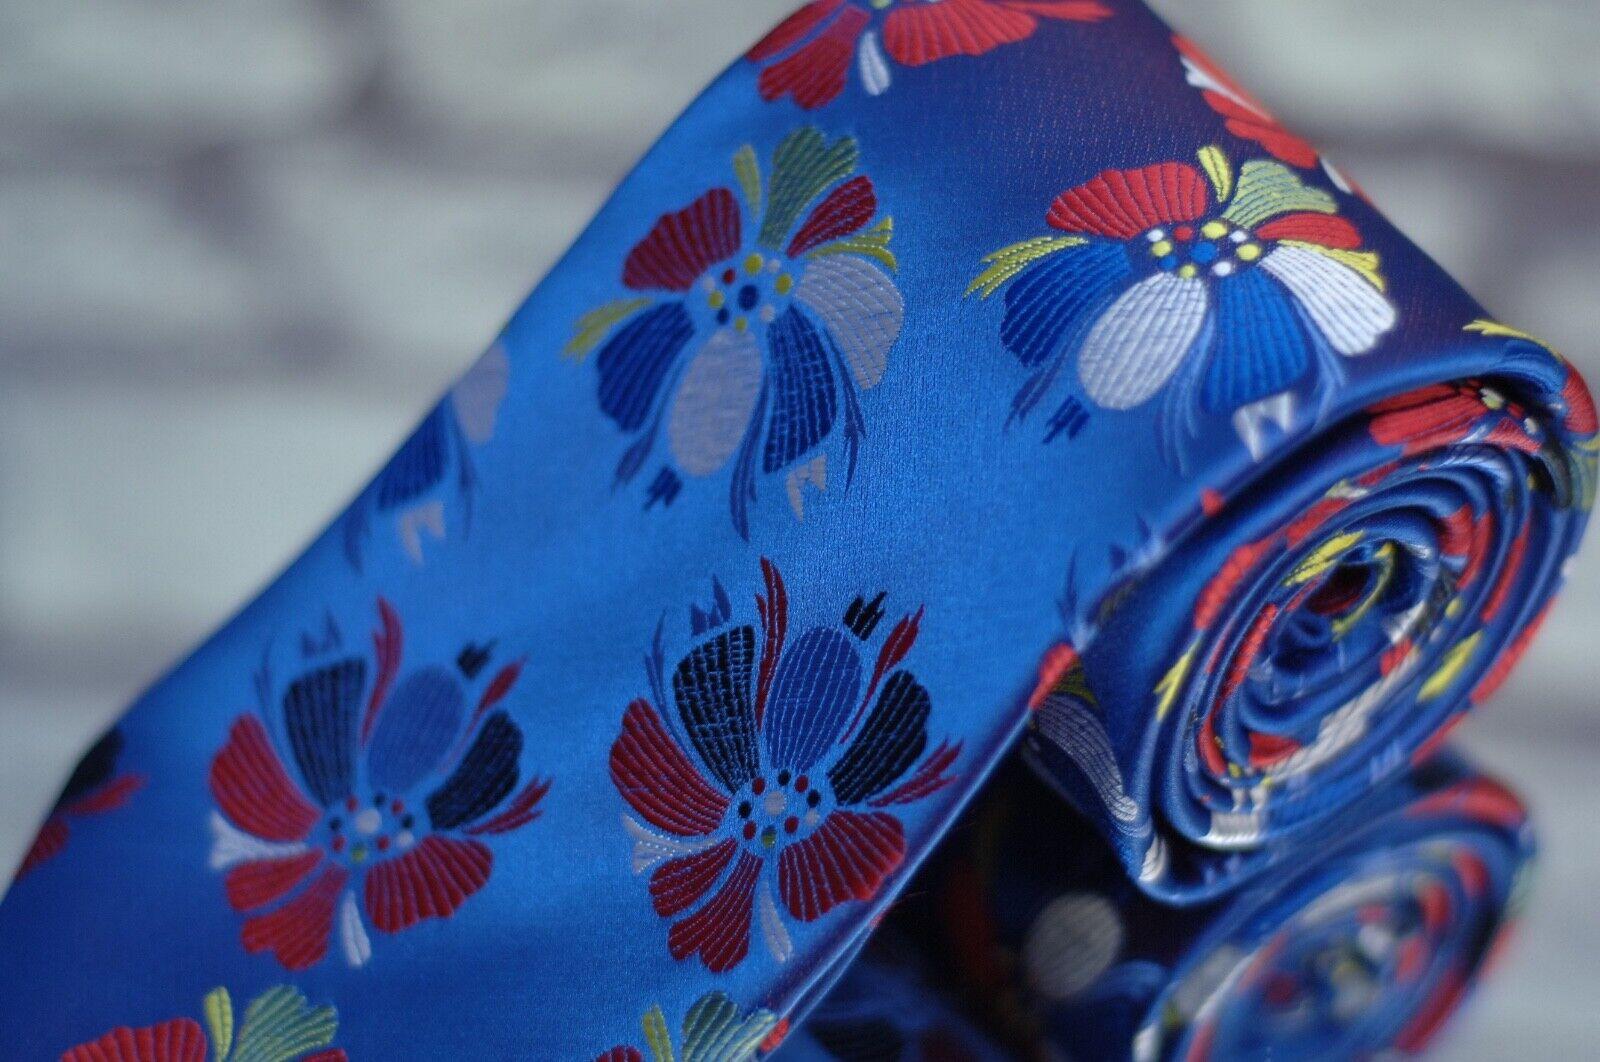 Lord R Colton Colton Colton Meisterwerke Limitierte Krawatte - Osaka Blood Blaume Blau - Neu     | Hohe Qualität und günstig  68ddc5